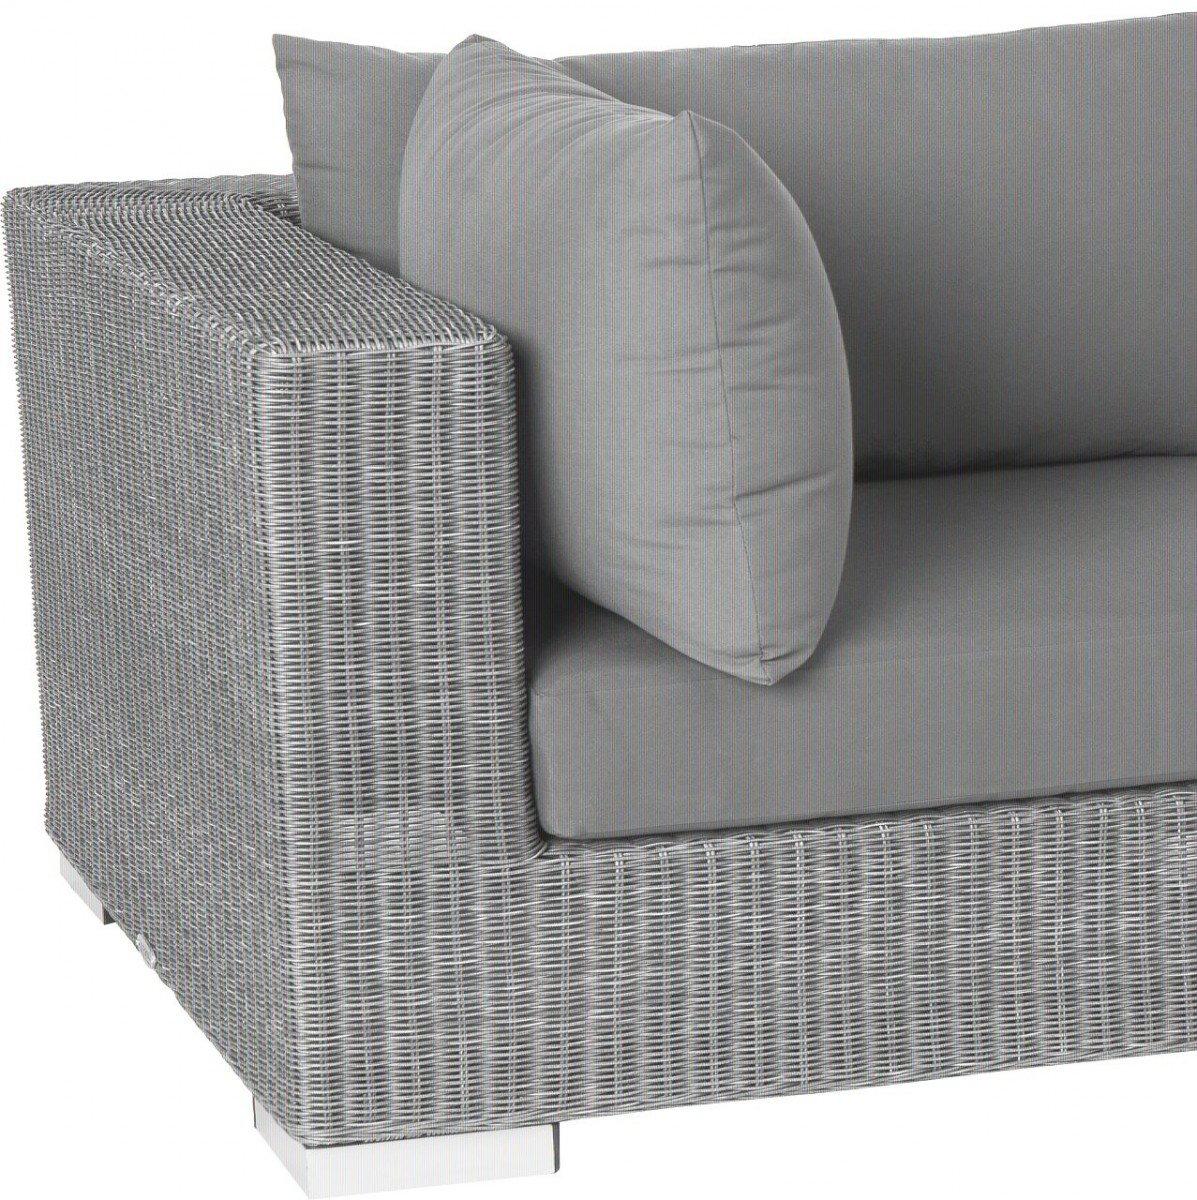 Dreams4Home Eckelement 'Quincy' – Sitz, Sofa, Stuhl, Eckelement, Terrassenmöbel, Loungemöbel, Cocktailmöbel, B/H/T: 87 x 64,5 x 87 cm, Gartenmöbel inklusive Kissen, Rattan, Aluminiumgestell, in grau kaufen